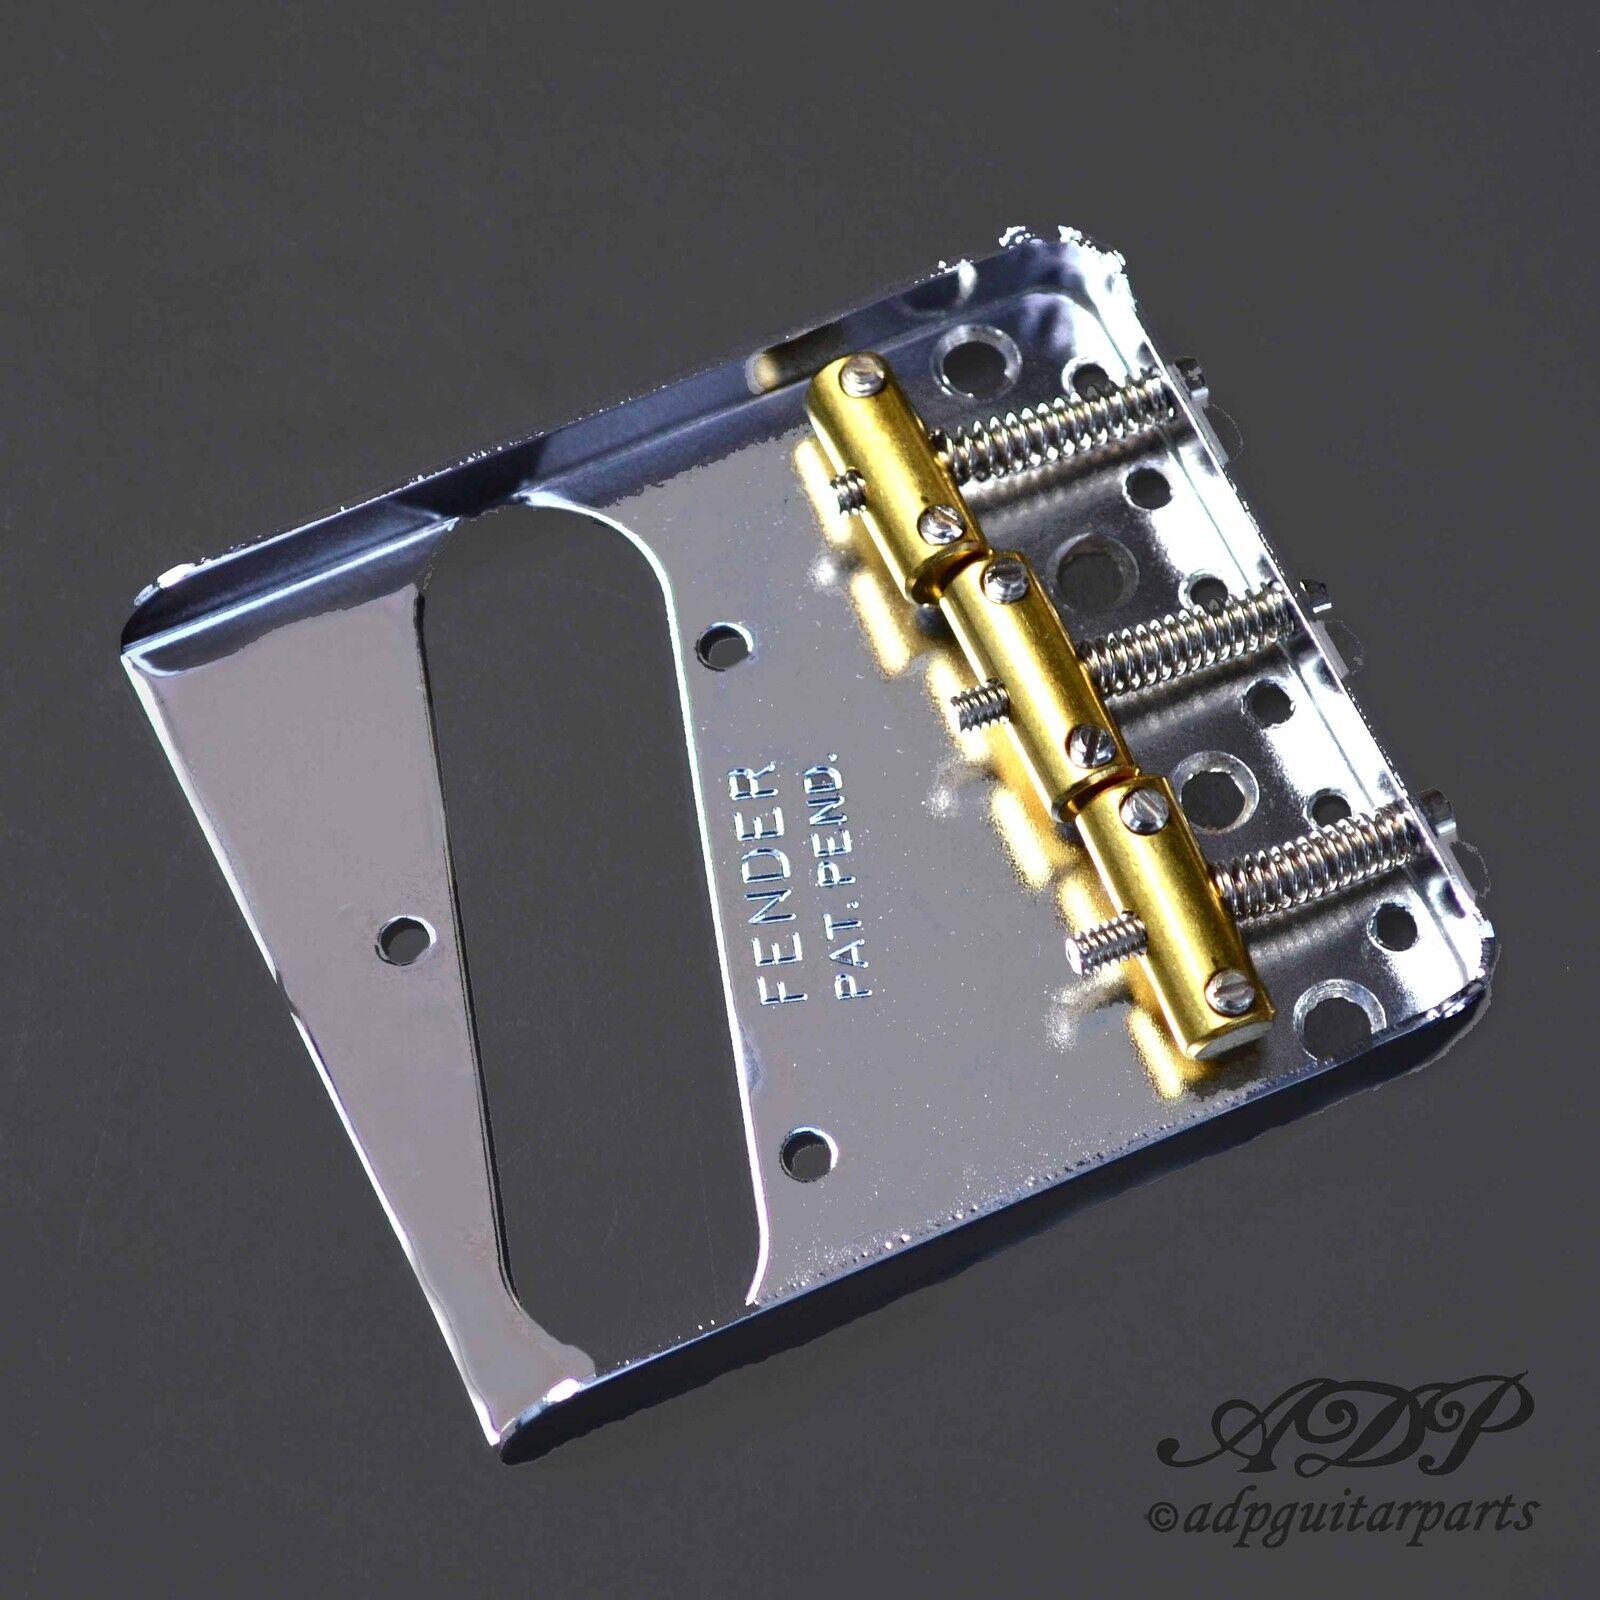 Cordier Telecaster Fender USA Pat-Pend  3xBrass SaddleTele Bridge  0990806100